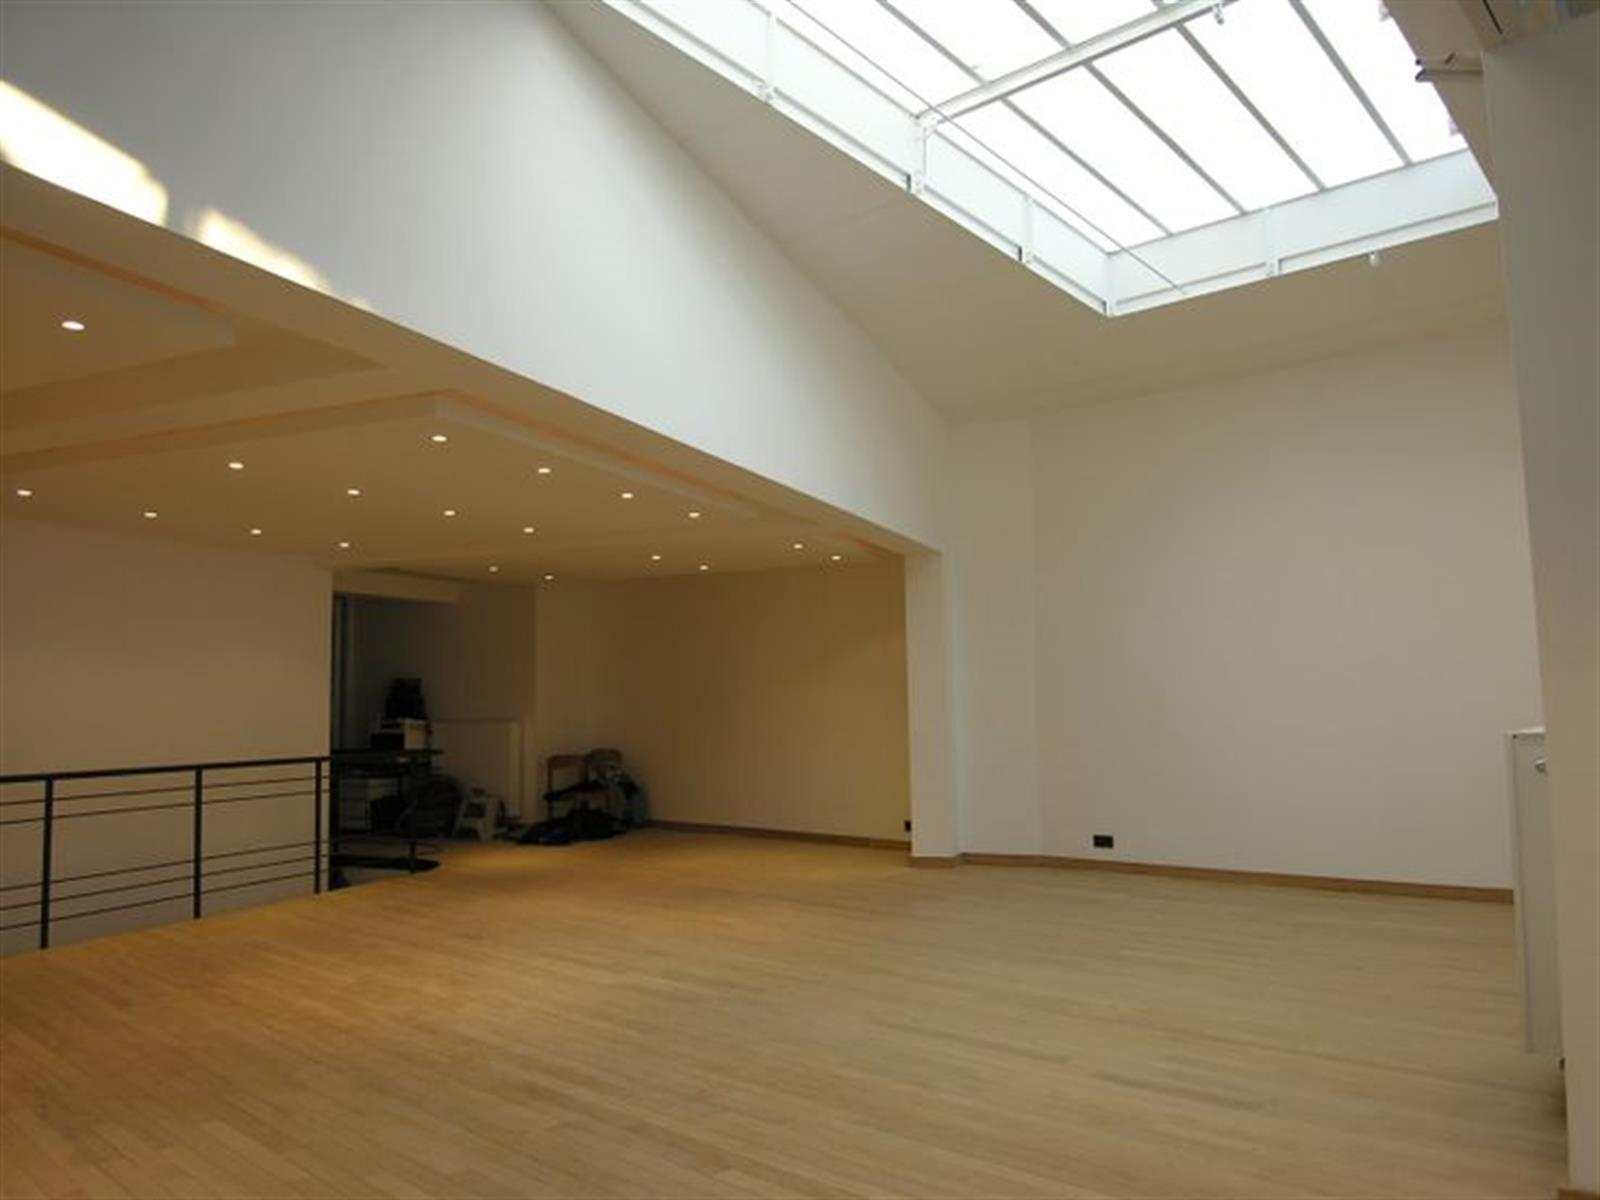 House - Etterbeek - #4365368-3